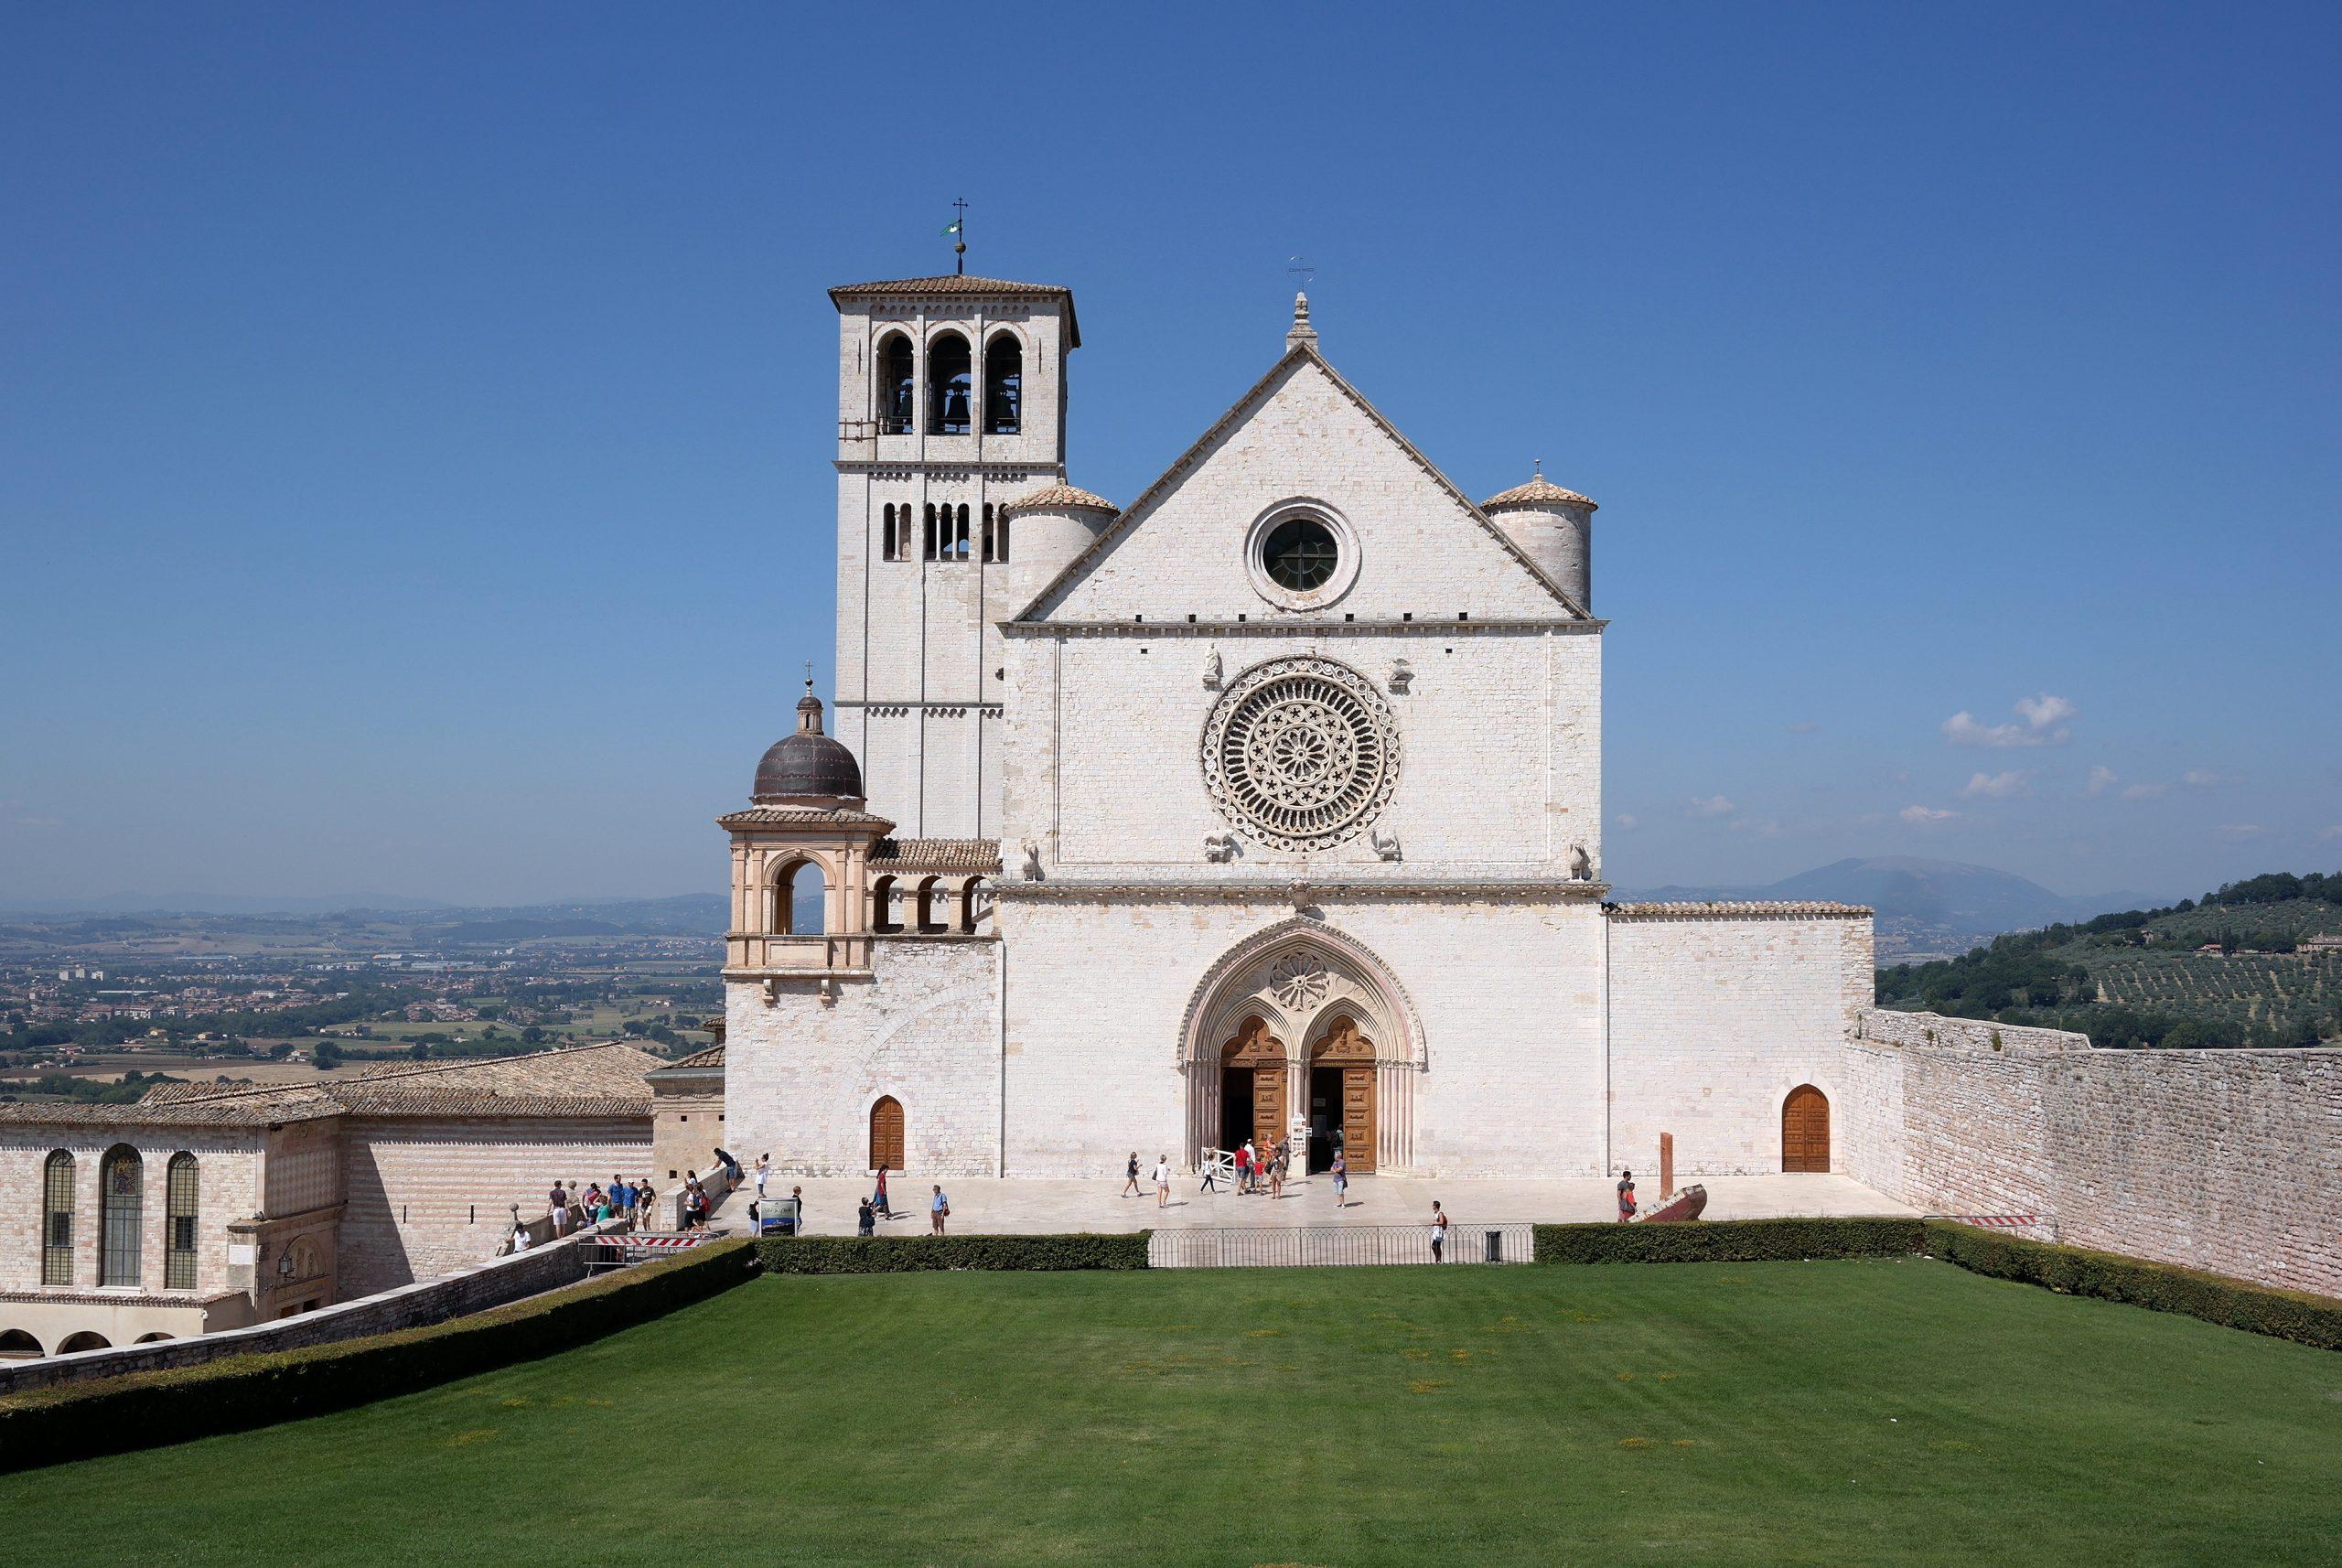 Basilica of Saint Francis, Assisi (Umbria)